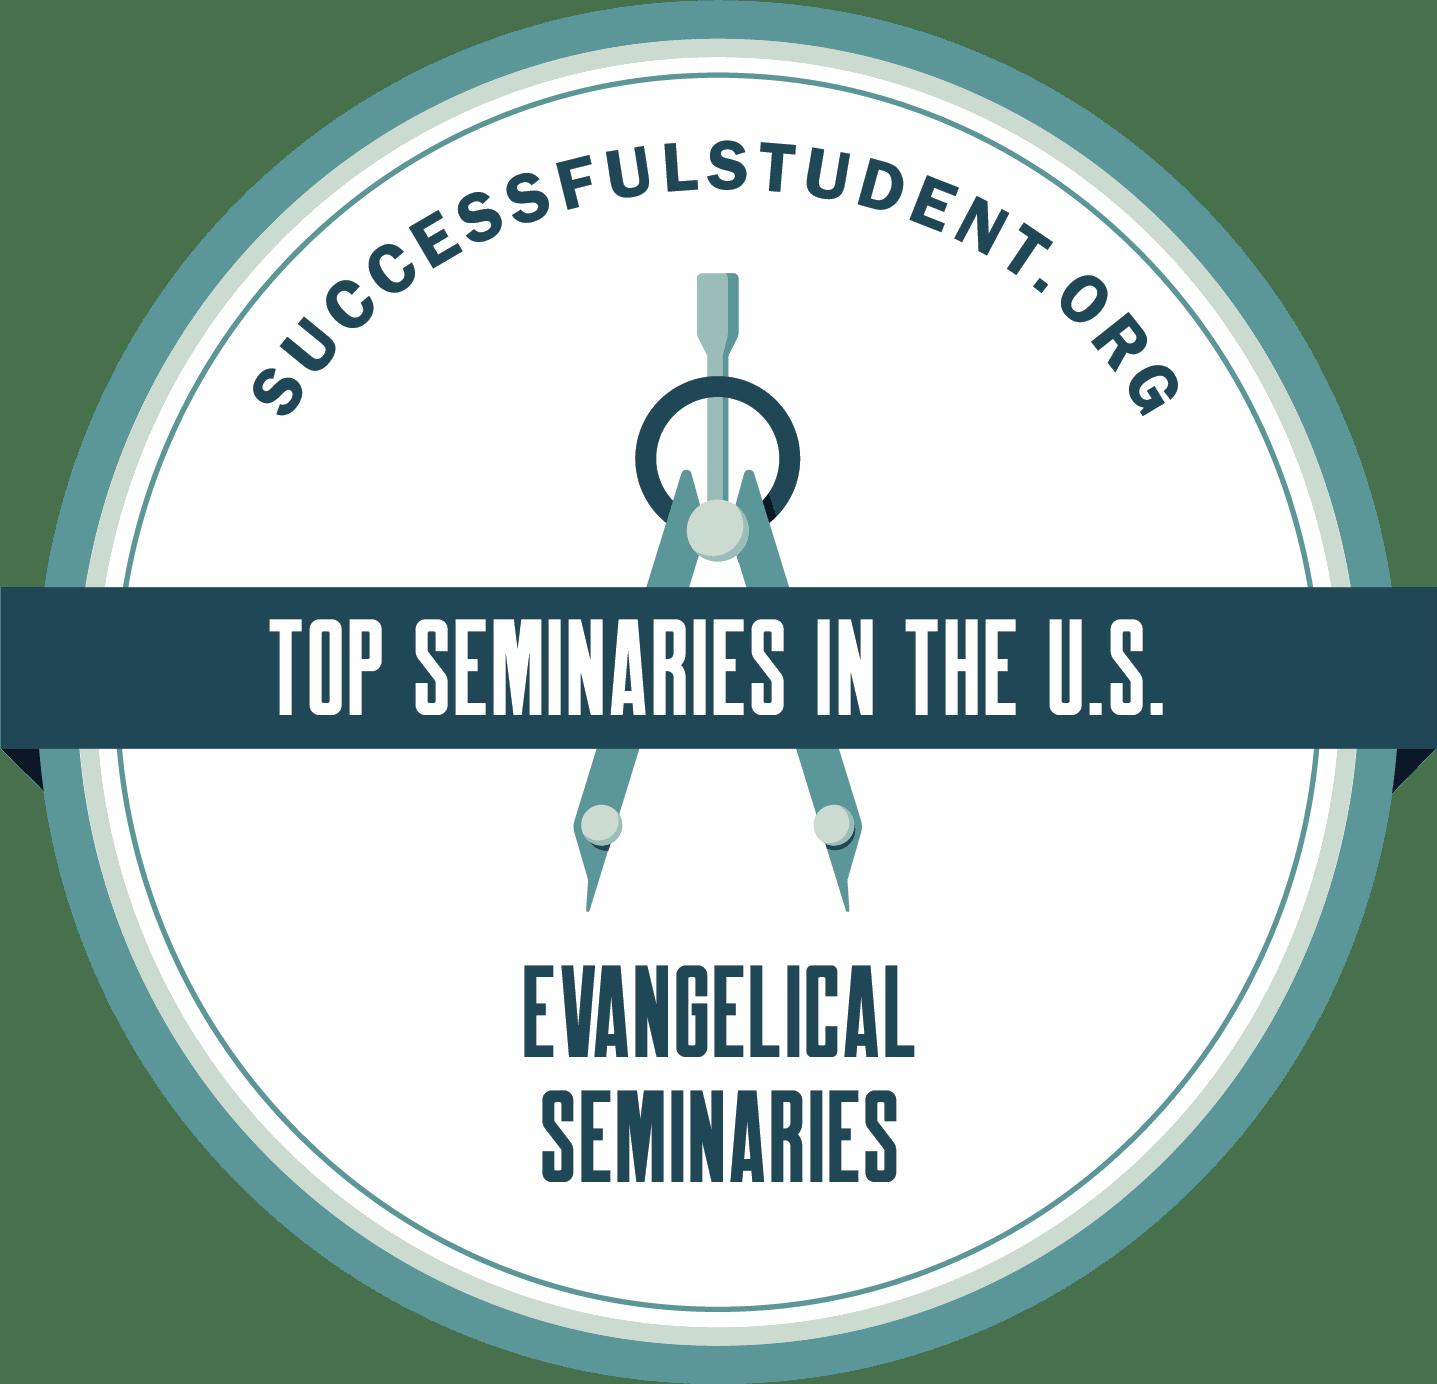 Top 10 Evangelical Seminaries in the US.'s Badge